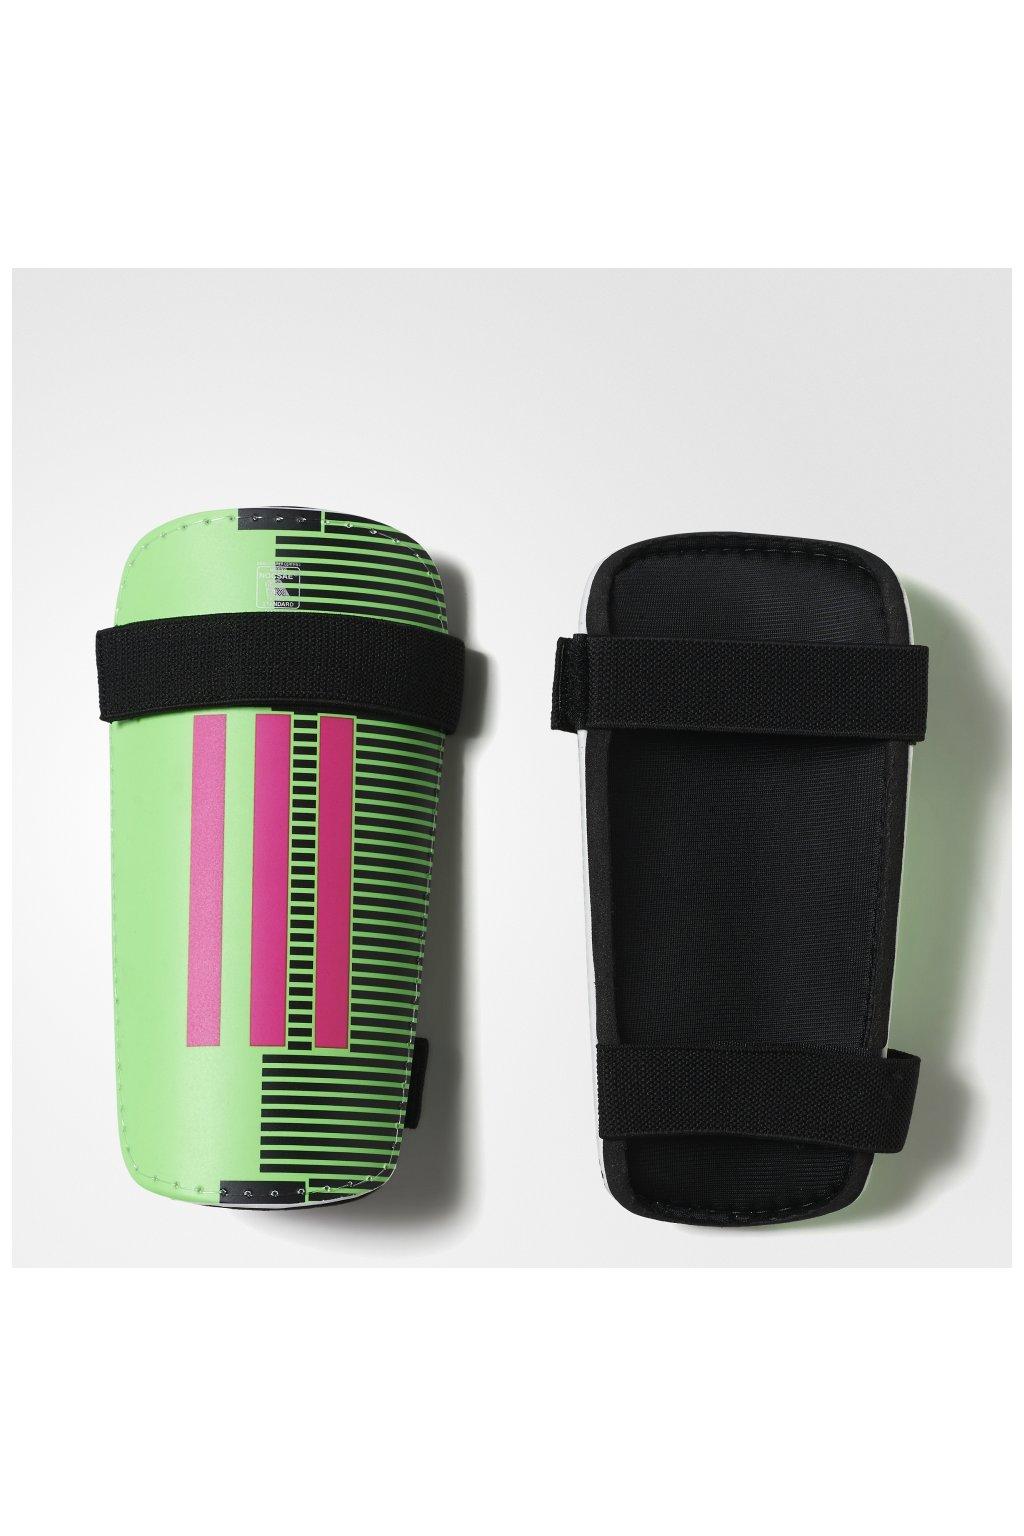 Holenné chránoče adidas 11 LITE AH7788